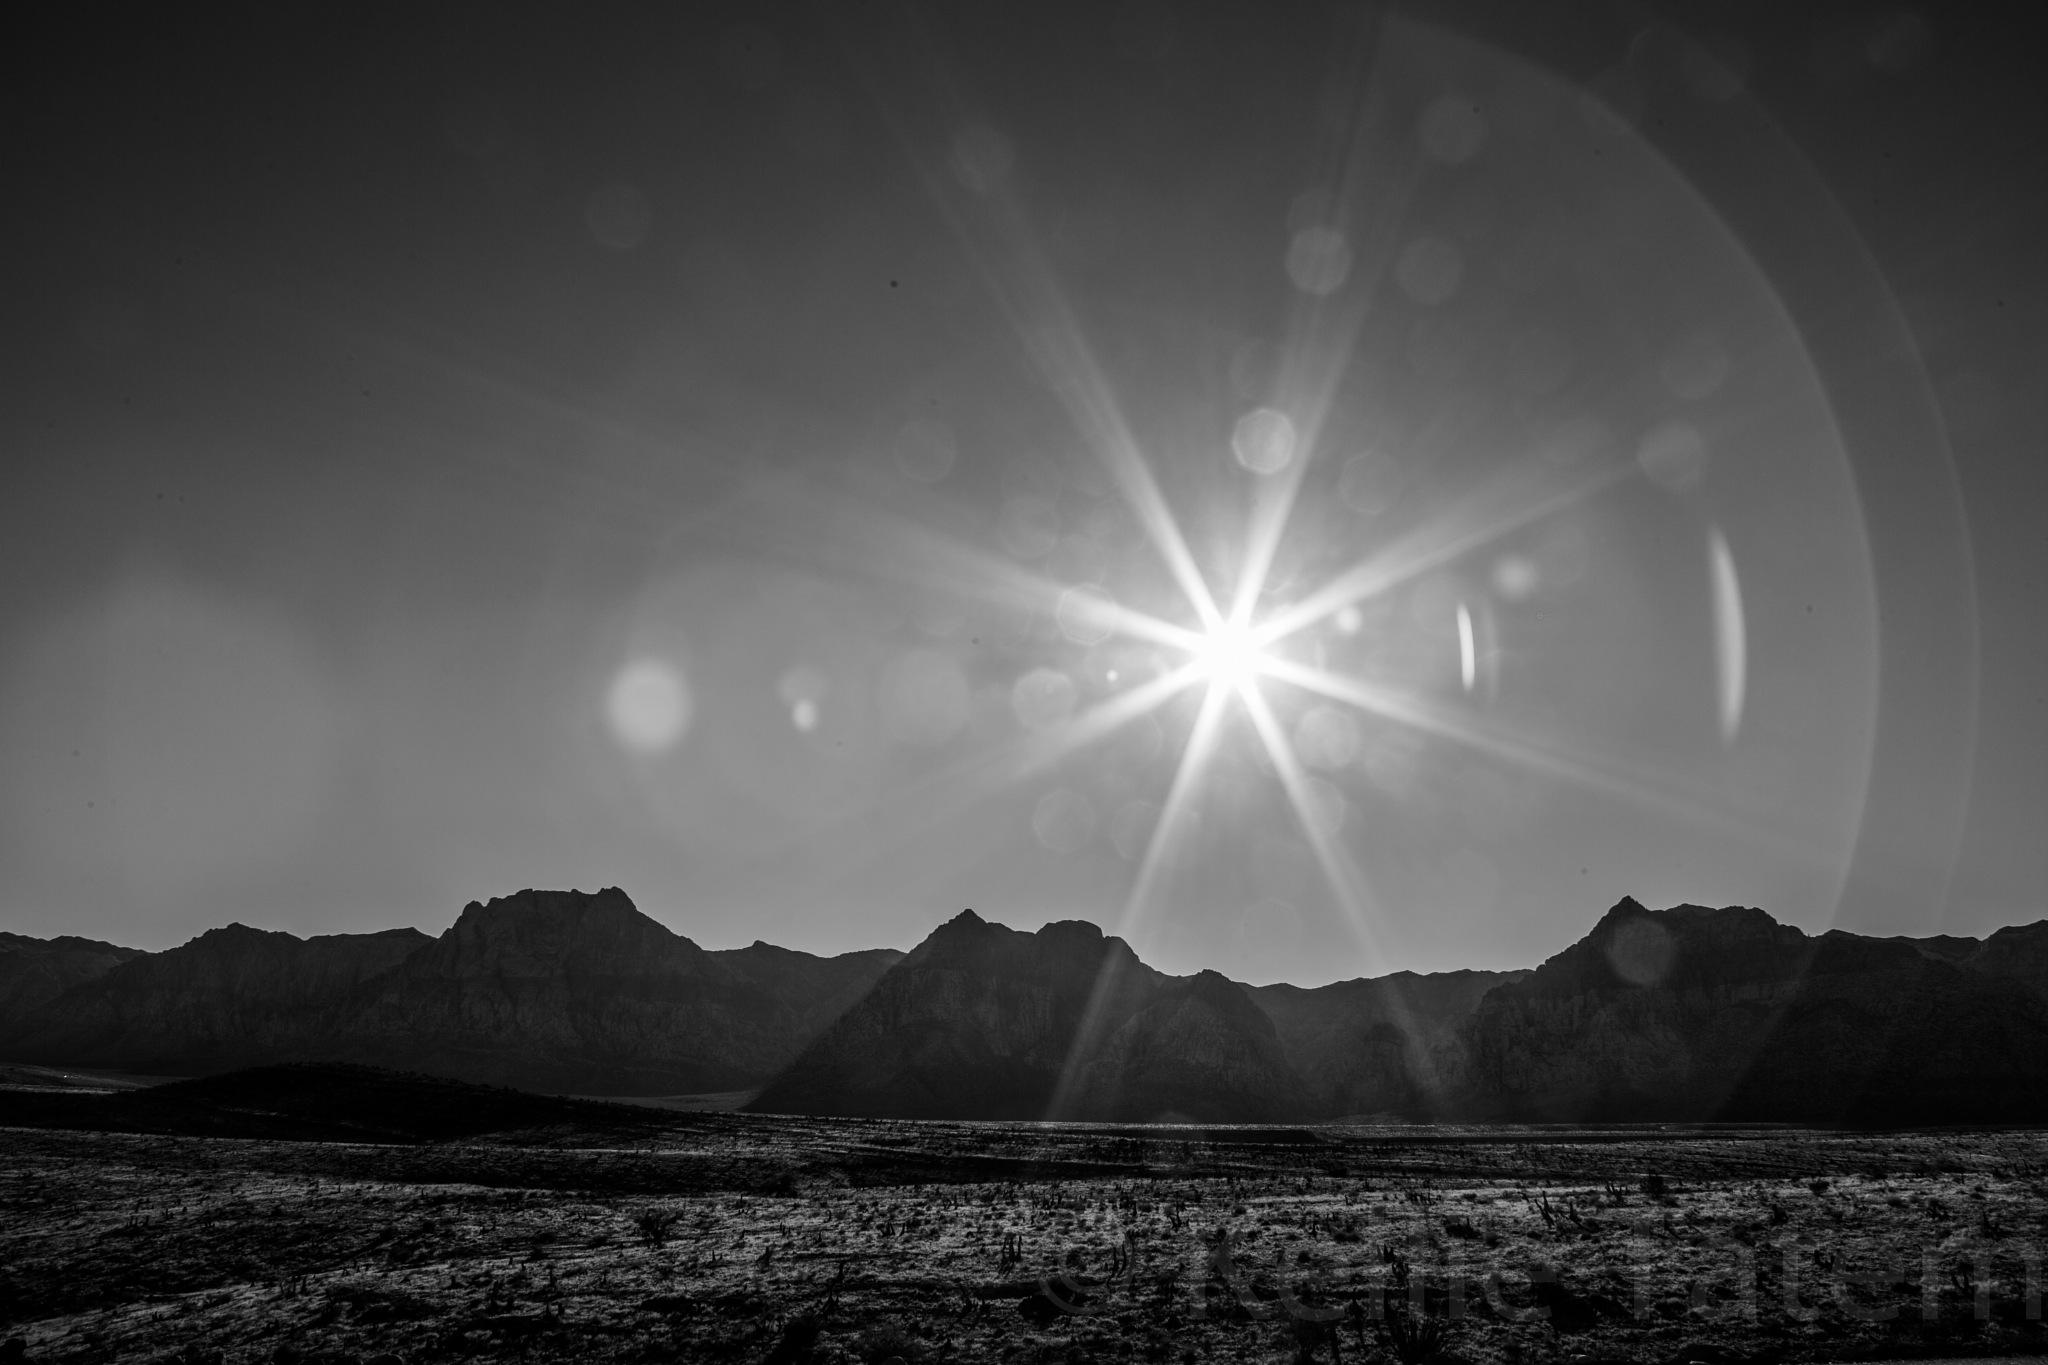 Desert afternoon by Kellie Tatem